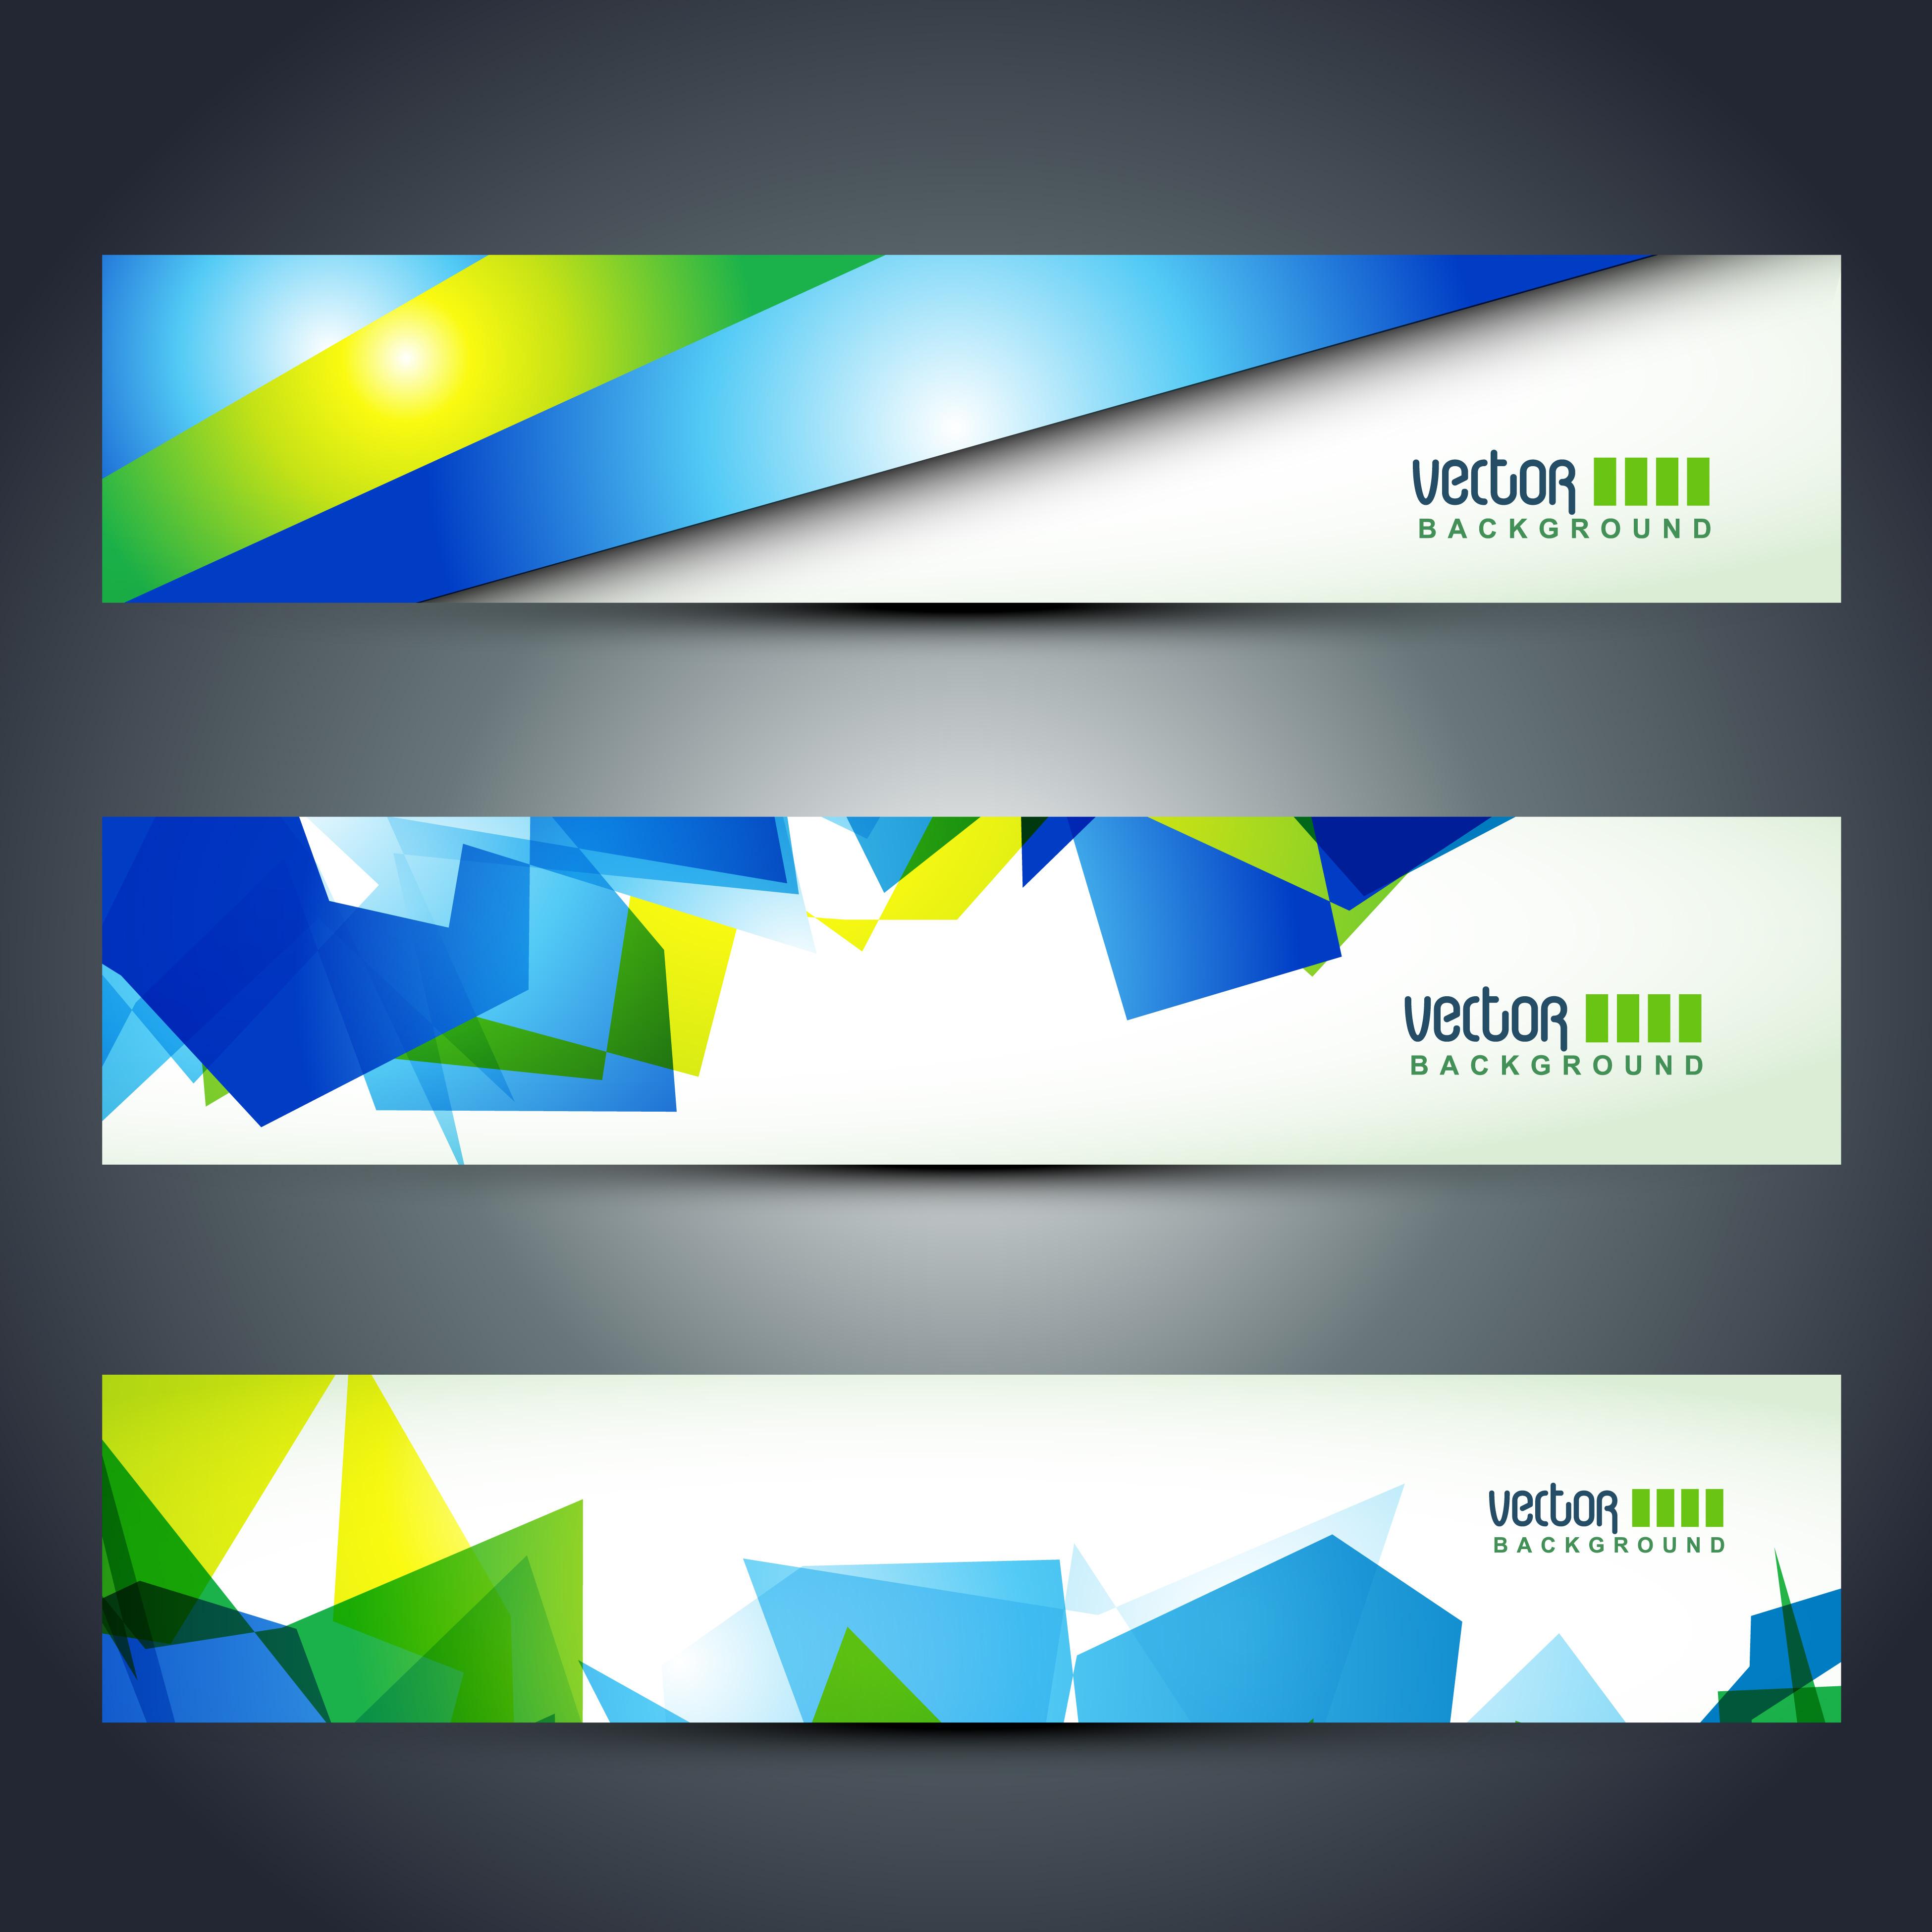 Header Footer Free Vector Art 1790 Free Downloads